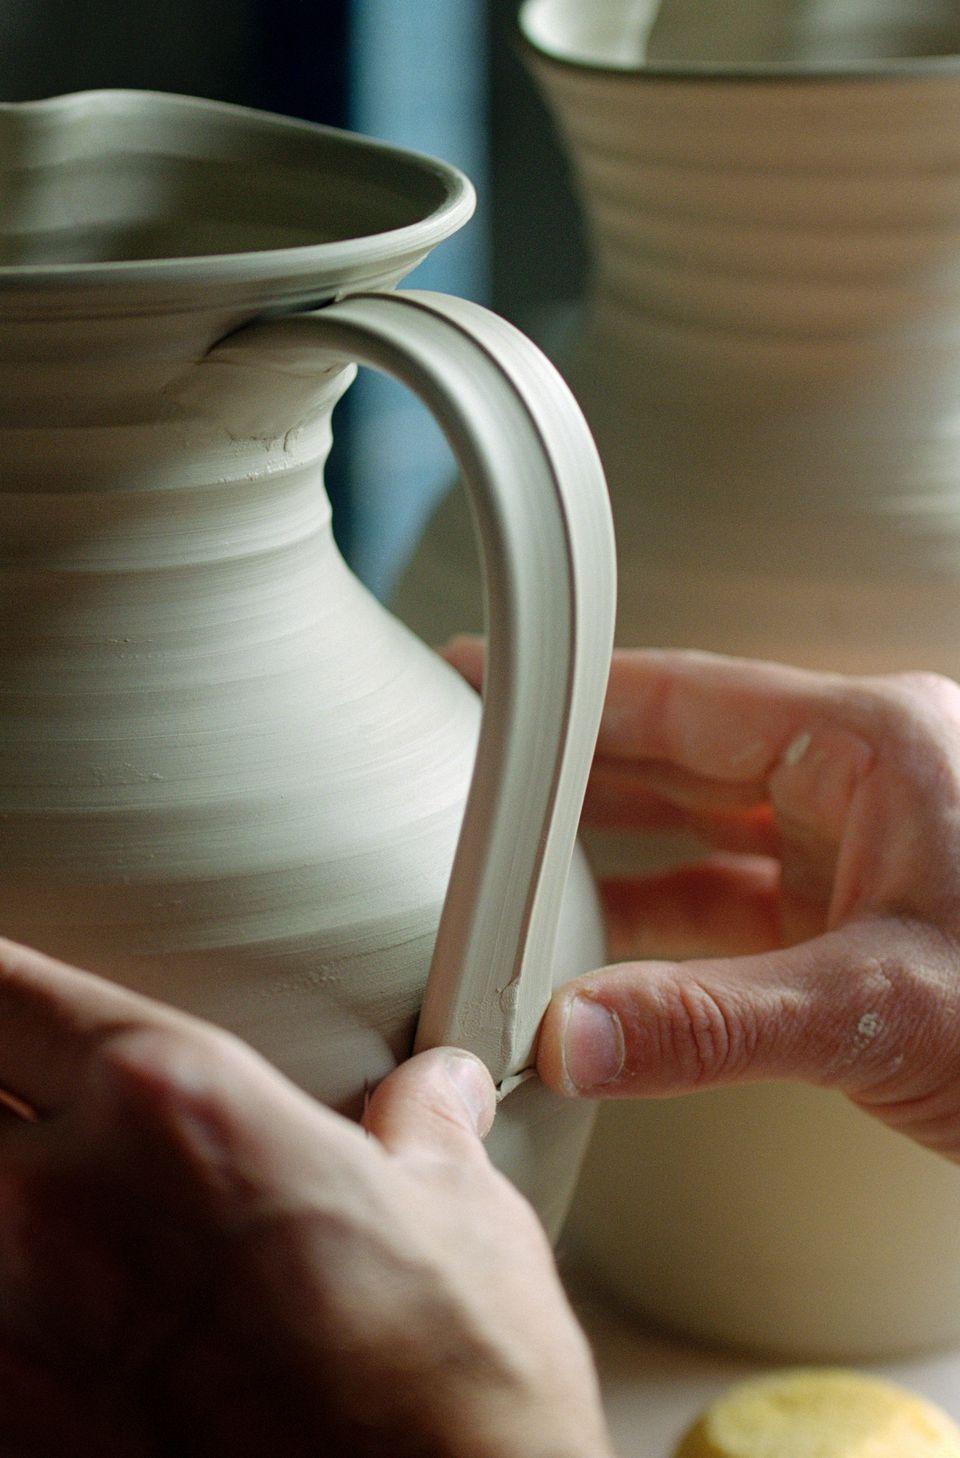 Pottery handle